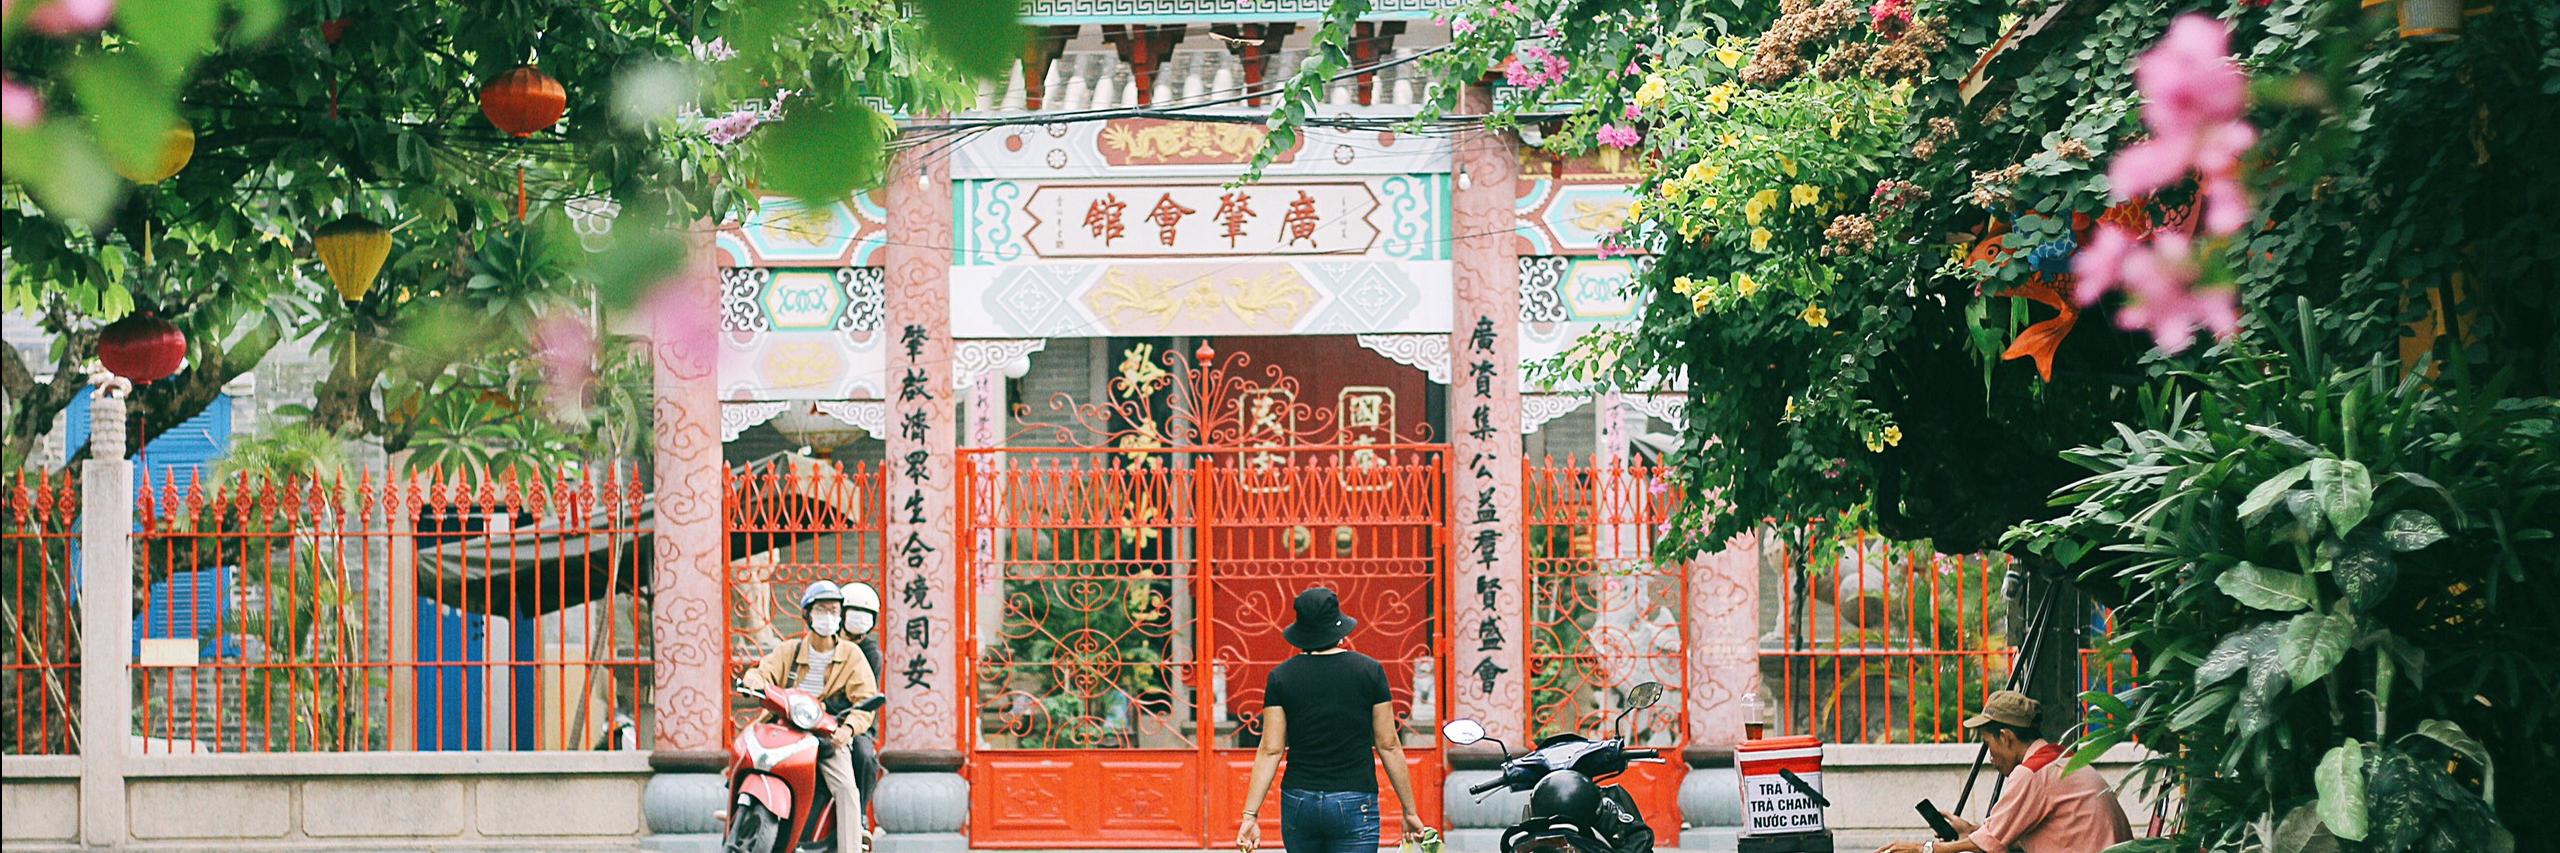 https://gody.vn/blog/congchua_mauhong803174/post/mot-ngay-du-lich-o-hoi-an-chi-voi-100-ngan-8886